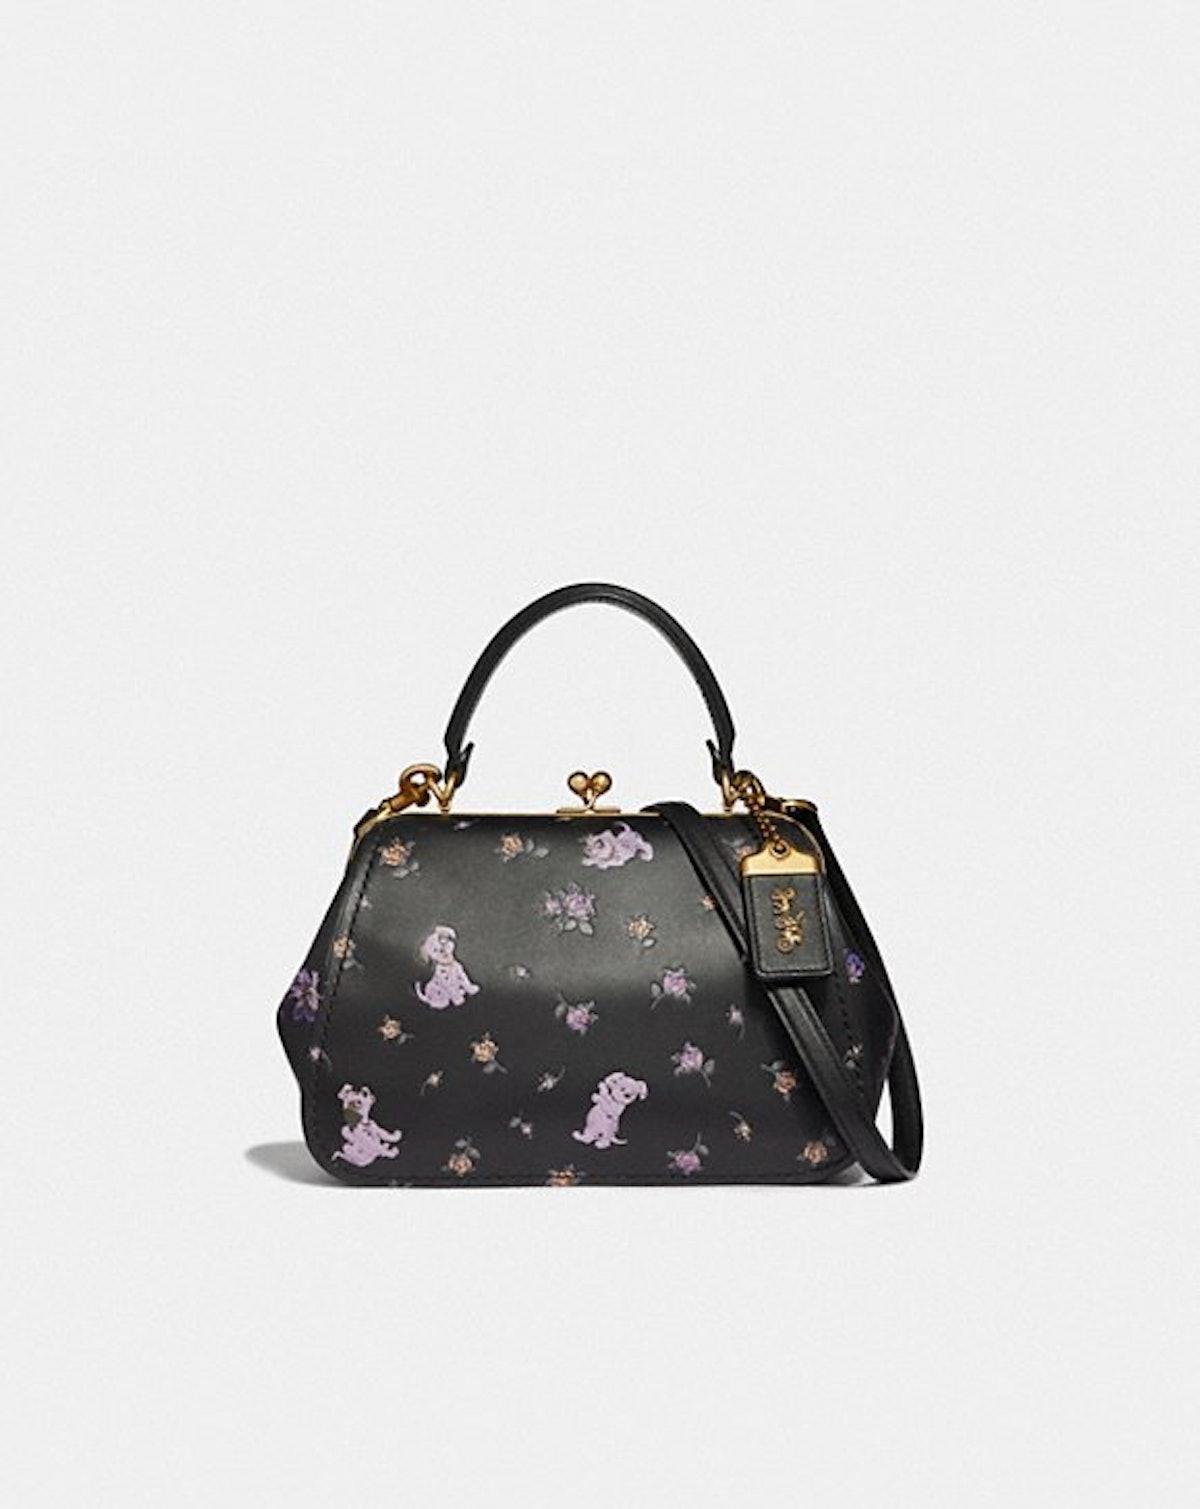 Disney X Coach Frame Bag 23 With Dalmatian Floral Print